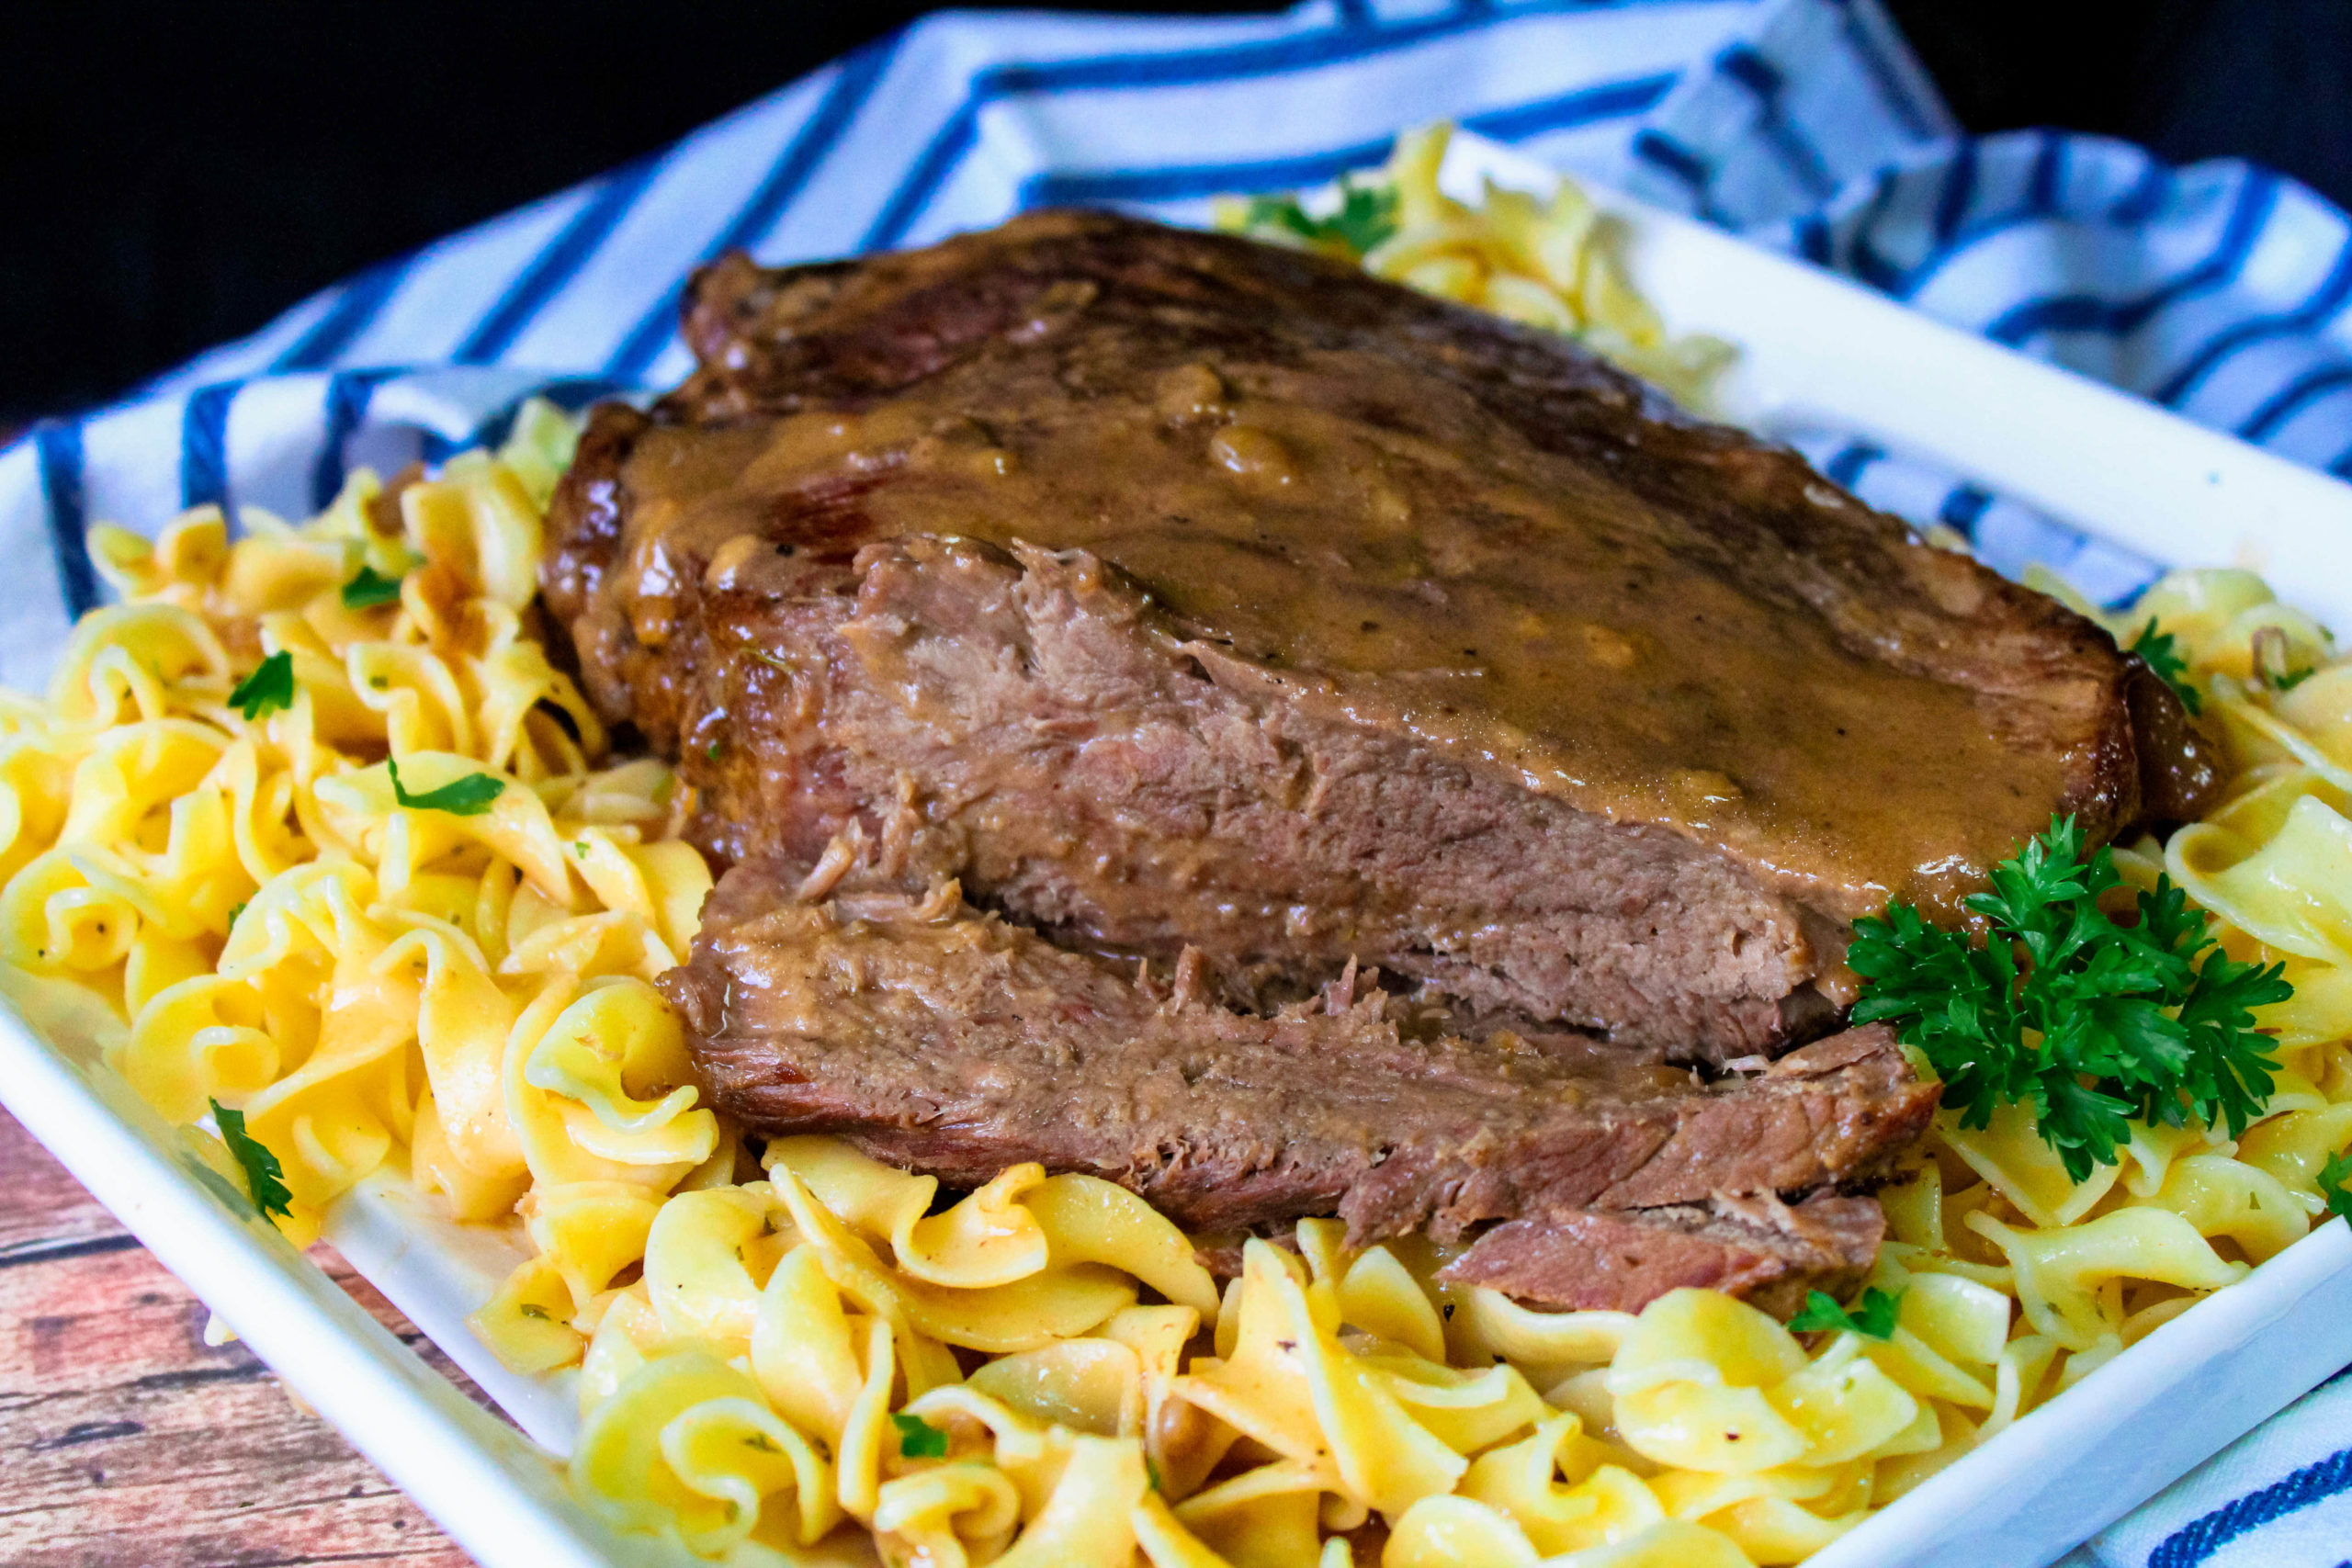 easy Crock Pot Roast With Gravy